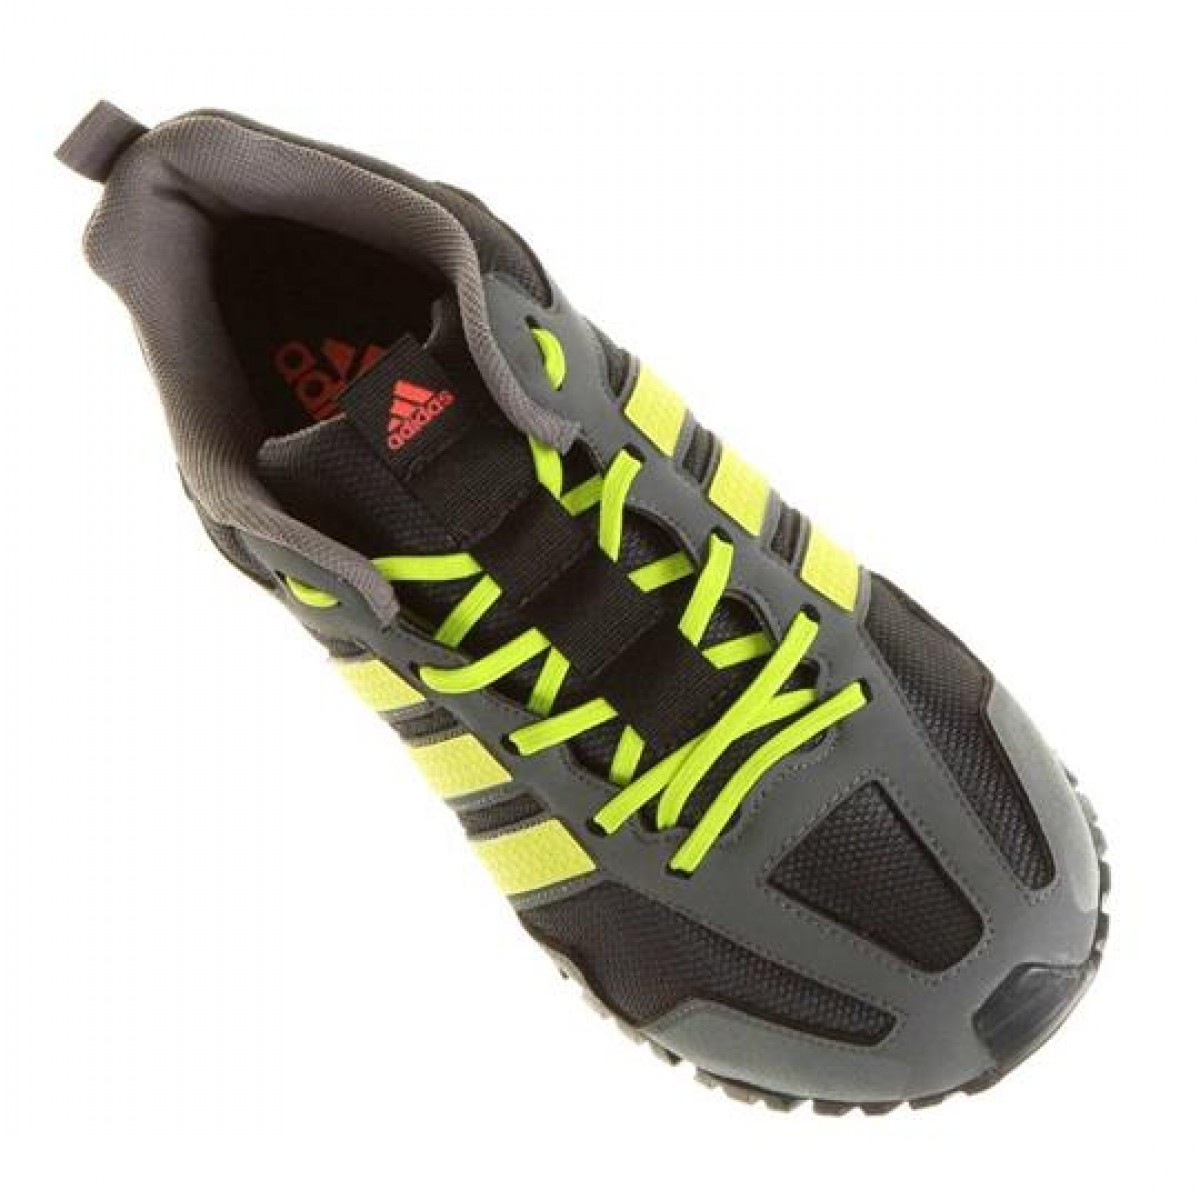 06f7cf3e3f9 ... Tênis Adidas Aresta S Masculino - Grafite e Verde ...